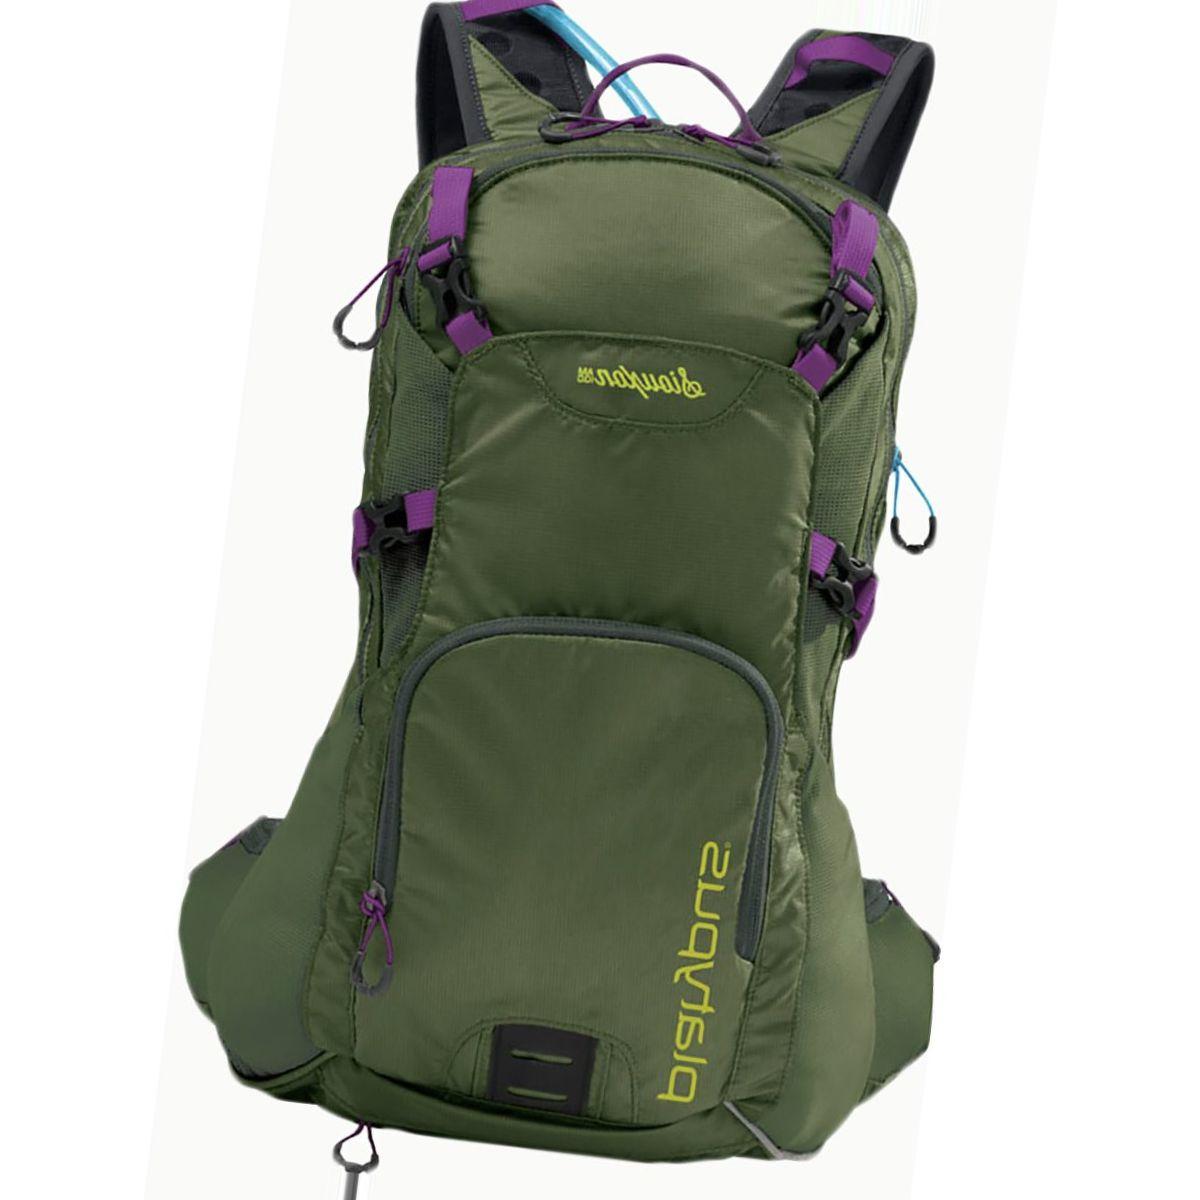 Platypus Siouxon A.M. 15L Backpack - Women's